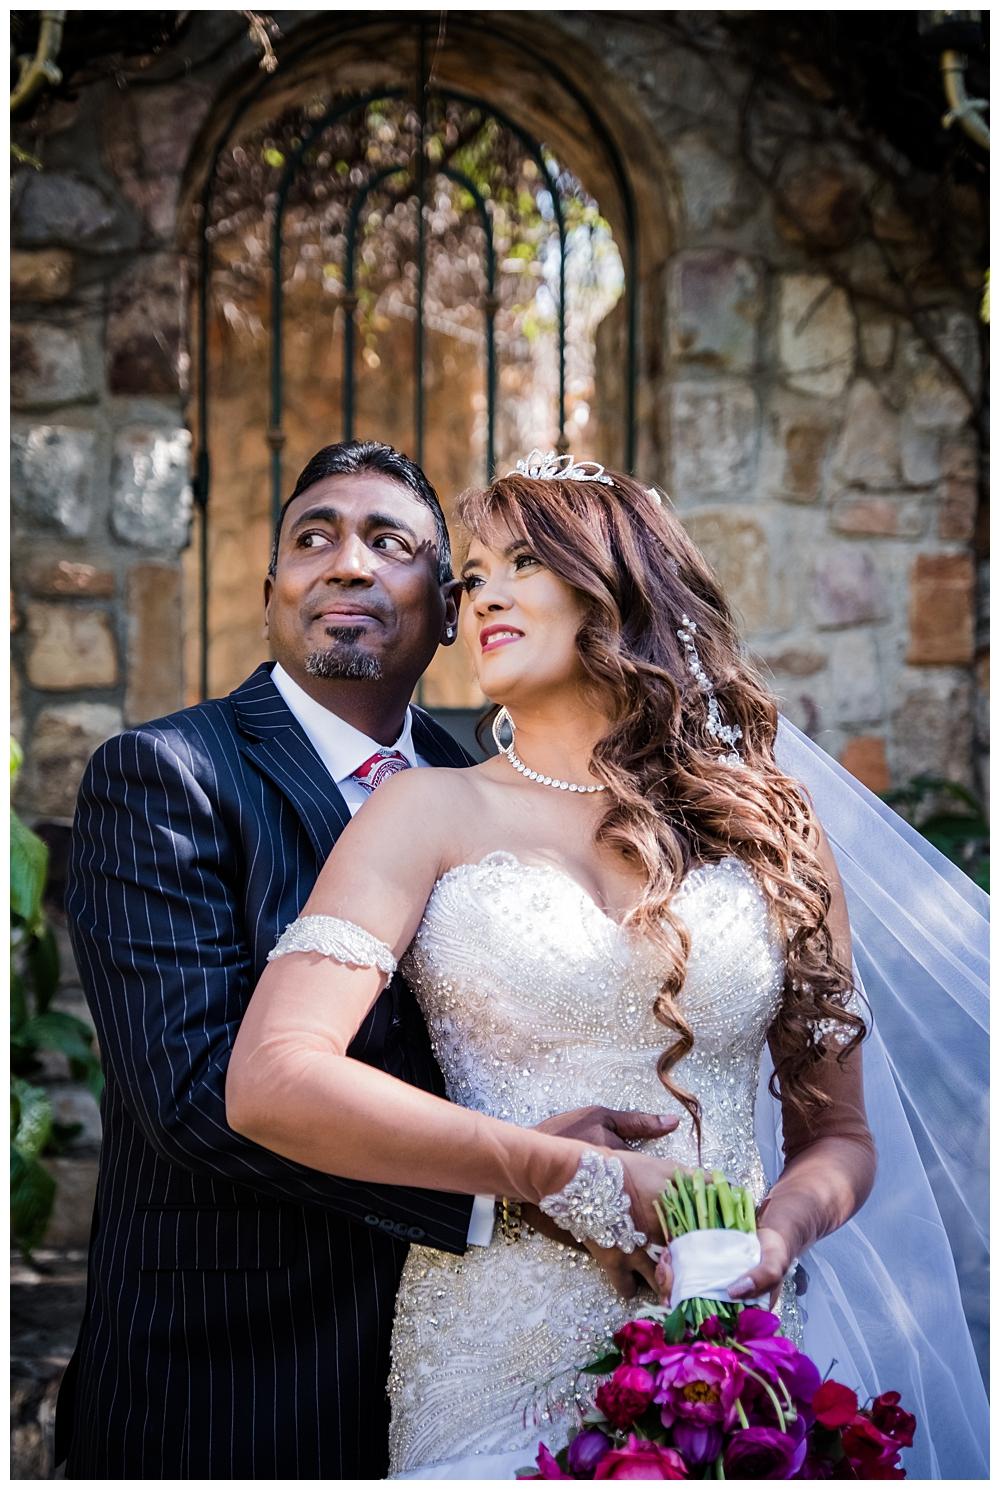 Best_Wedding_Photographer_AlexanderSmith_1849.jpg